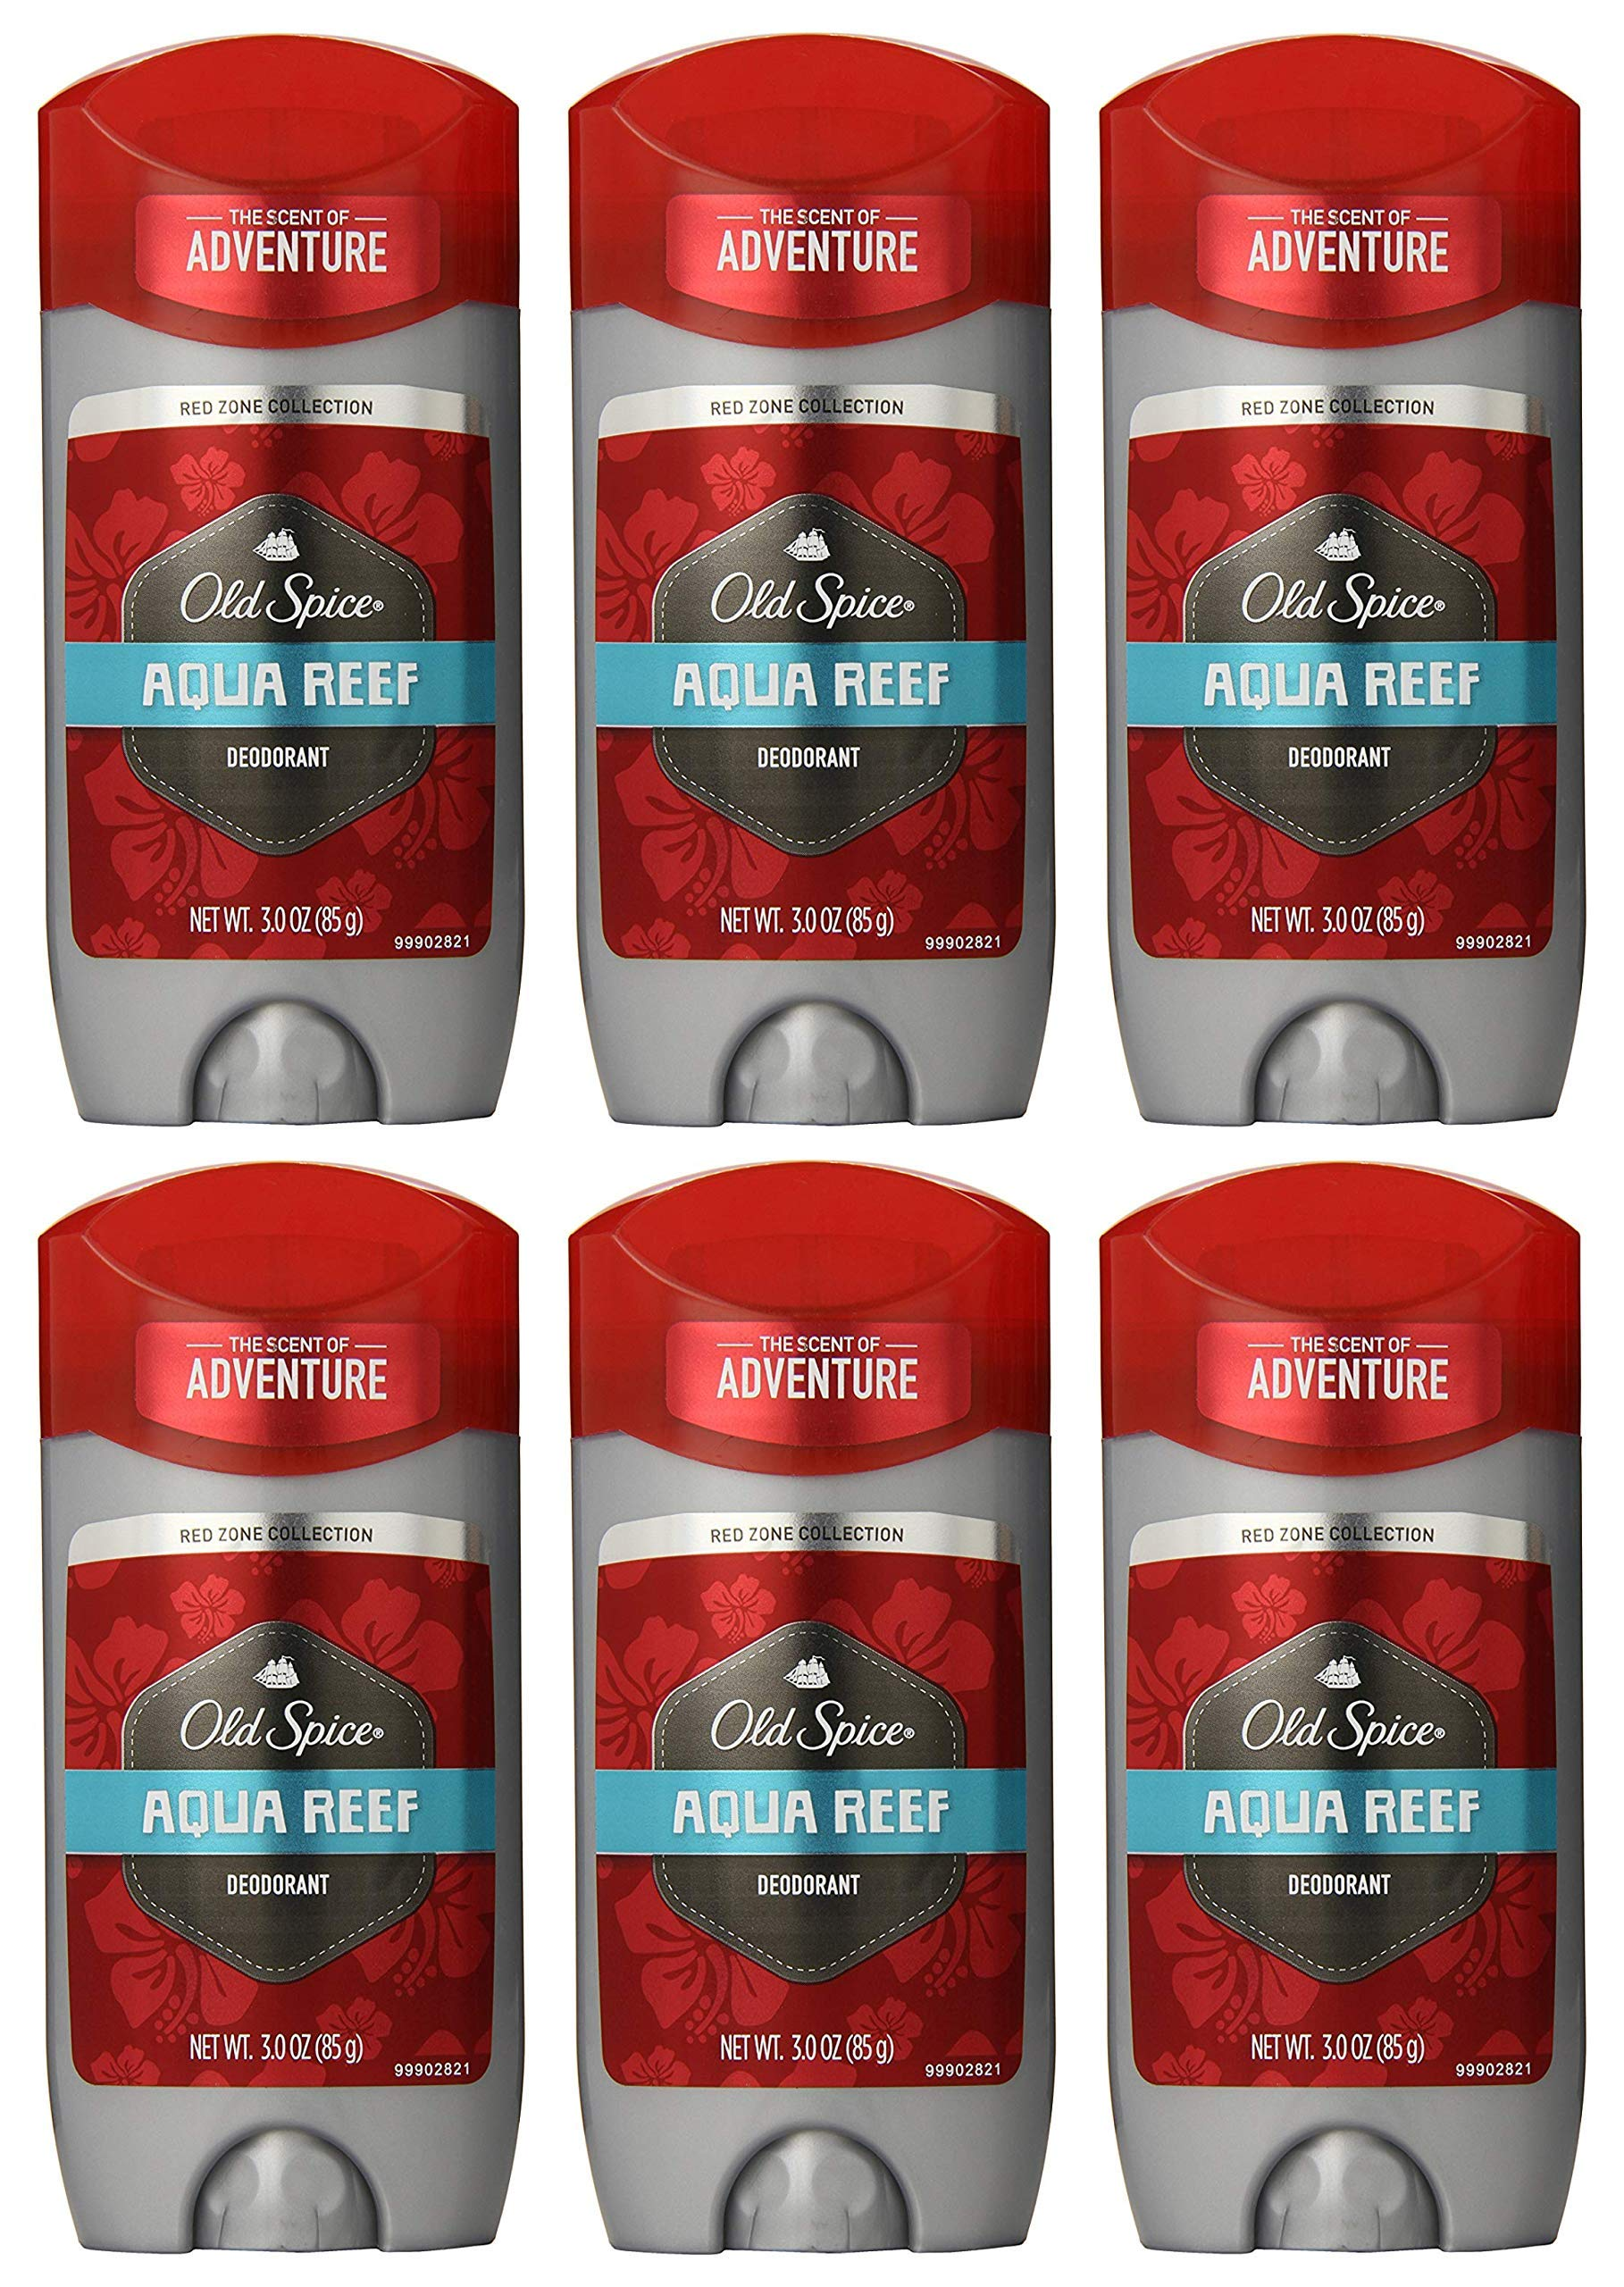 Old Spice Deodorant Aqua Reef Size 3 oz. (Pack of 6)